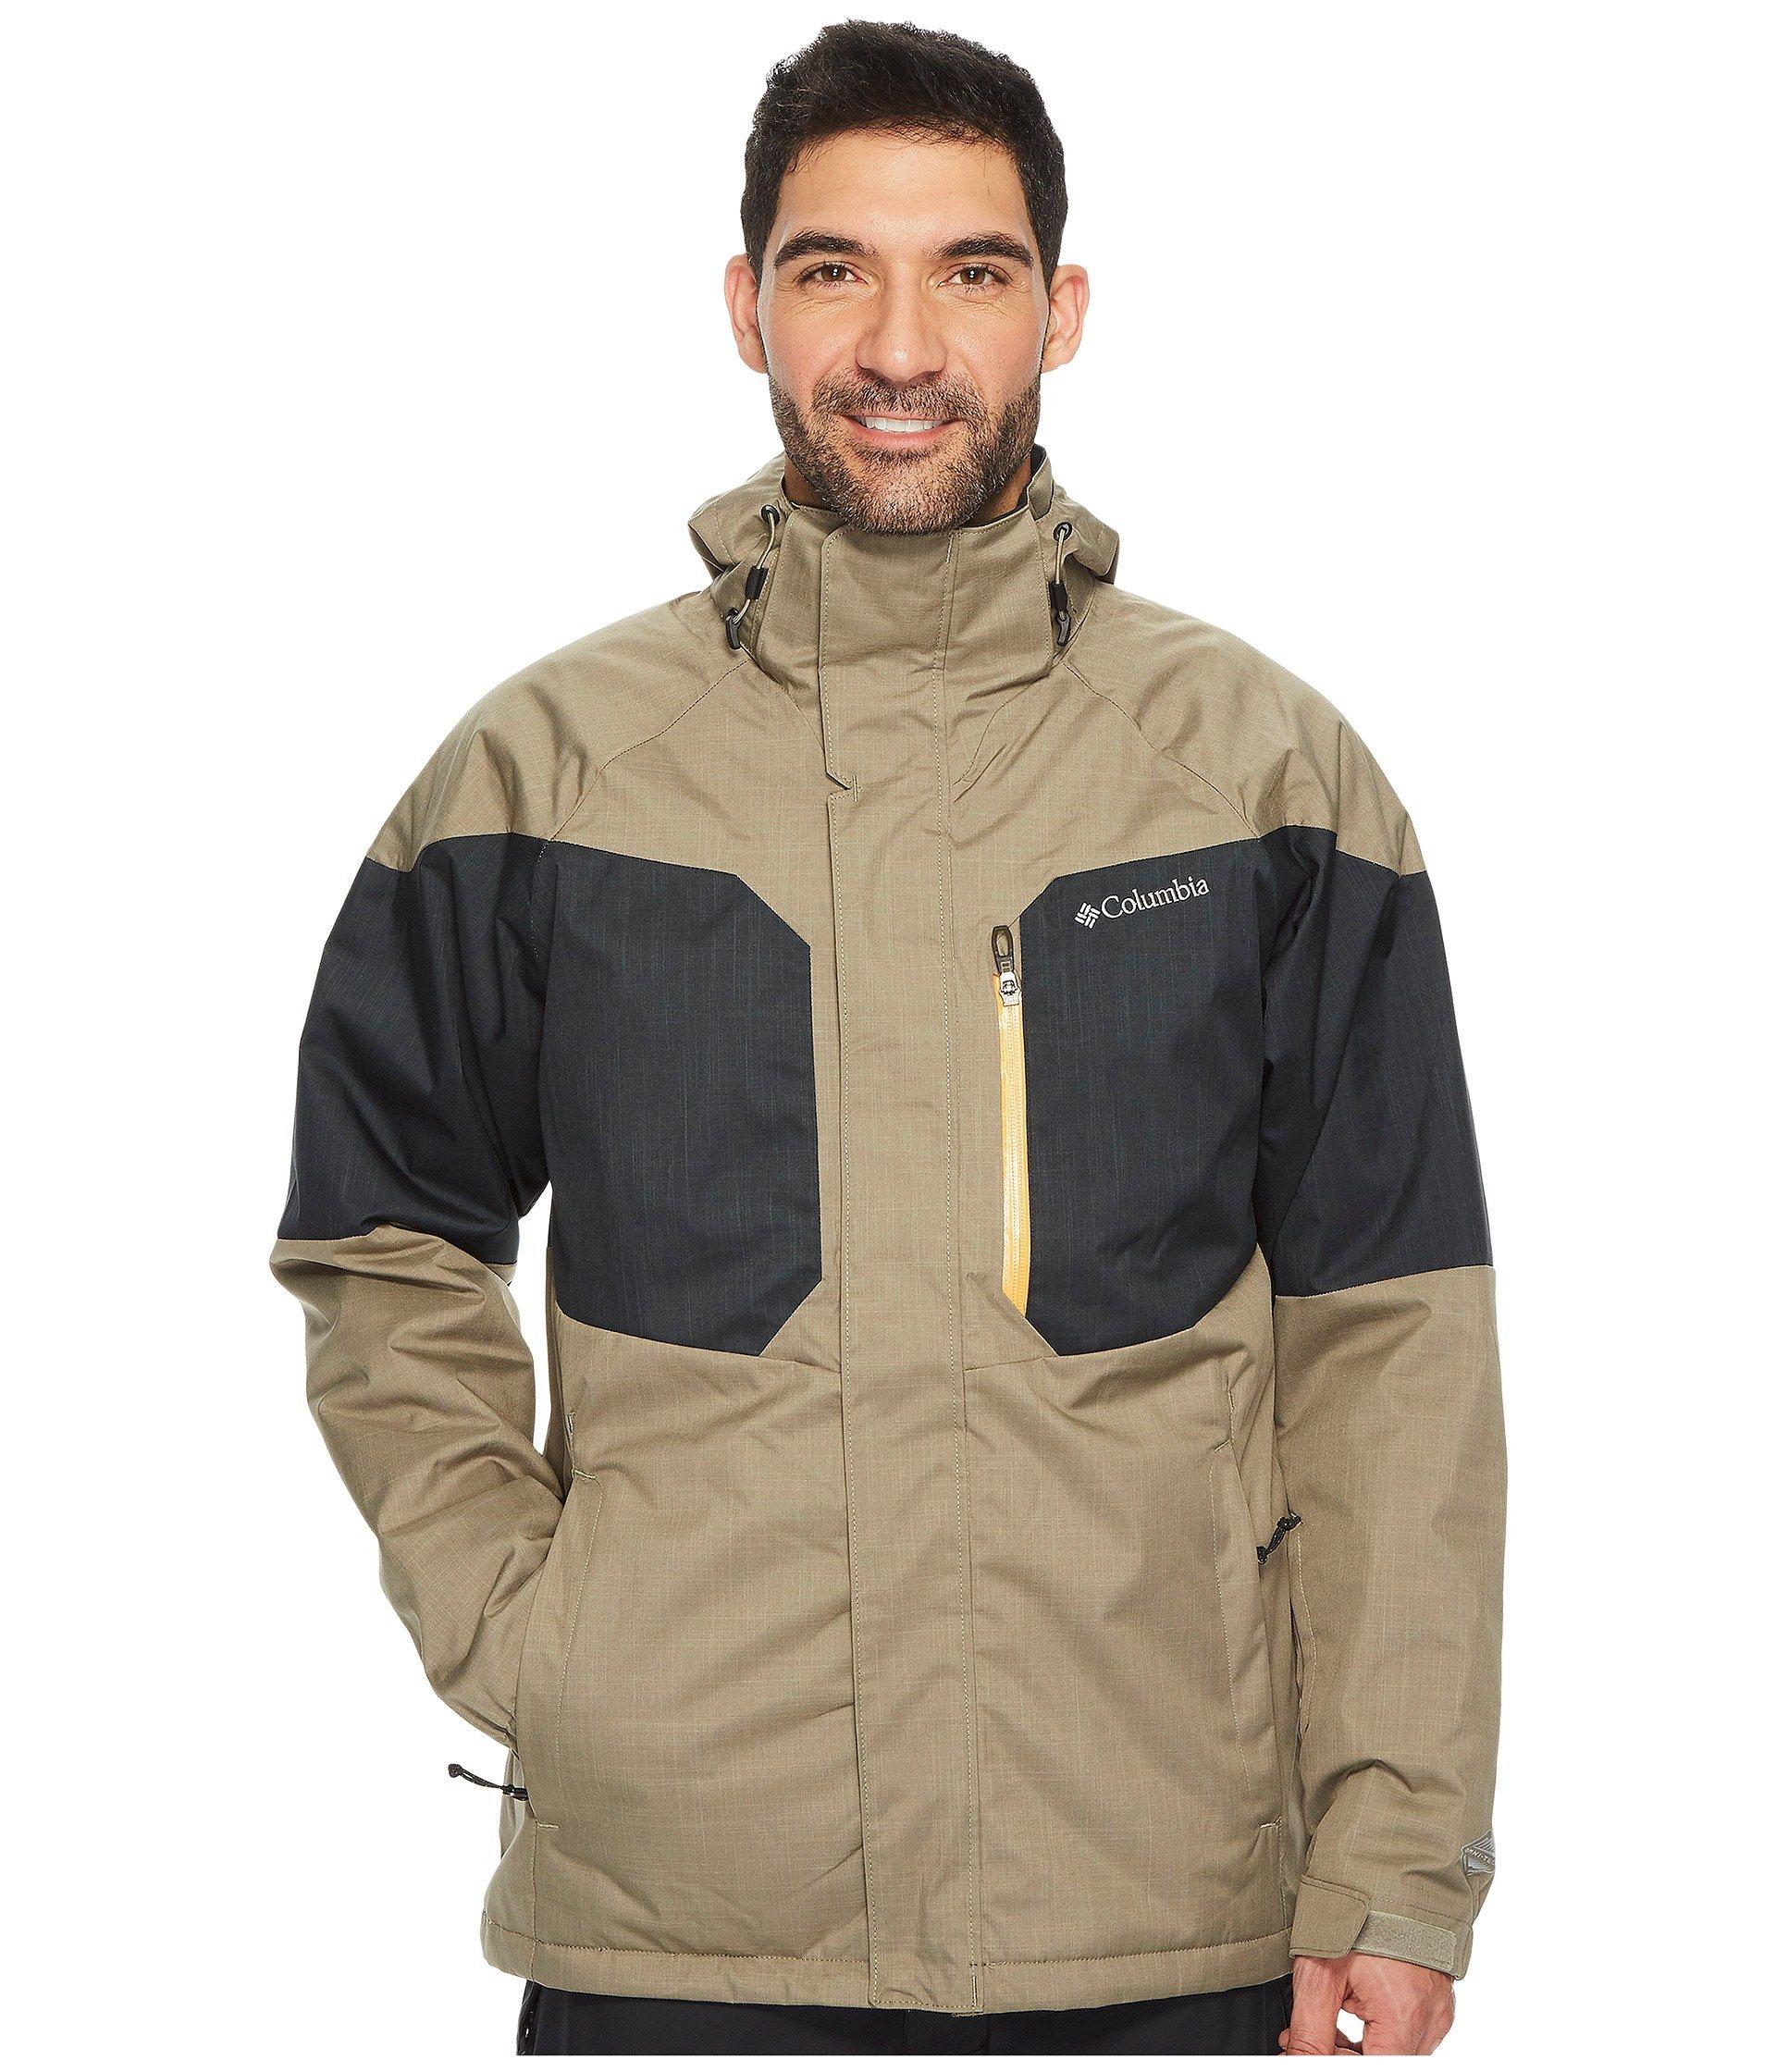 0cc518c74 Alpine Action™ Jacket in Sage/Black/Solarize